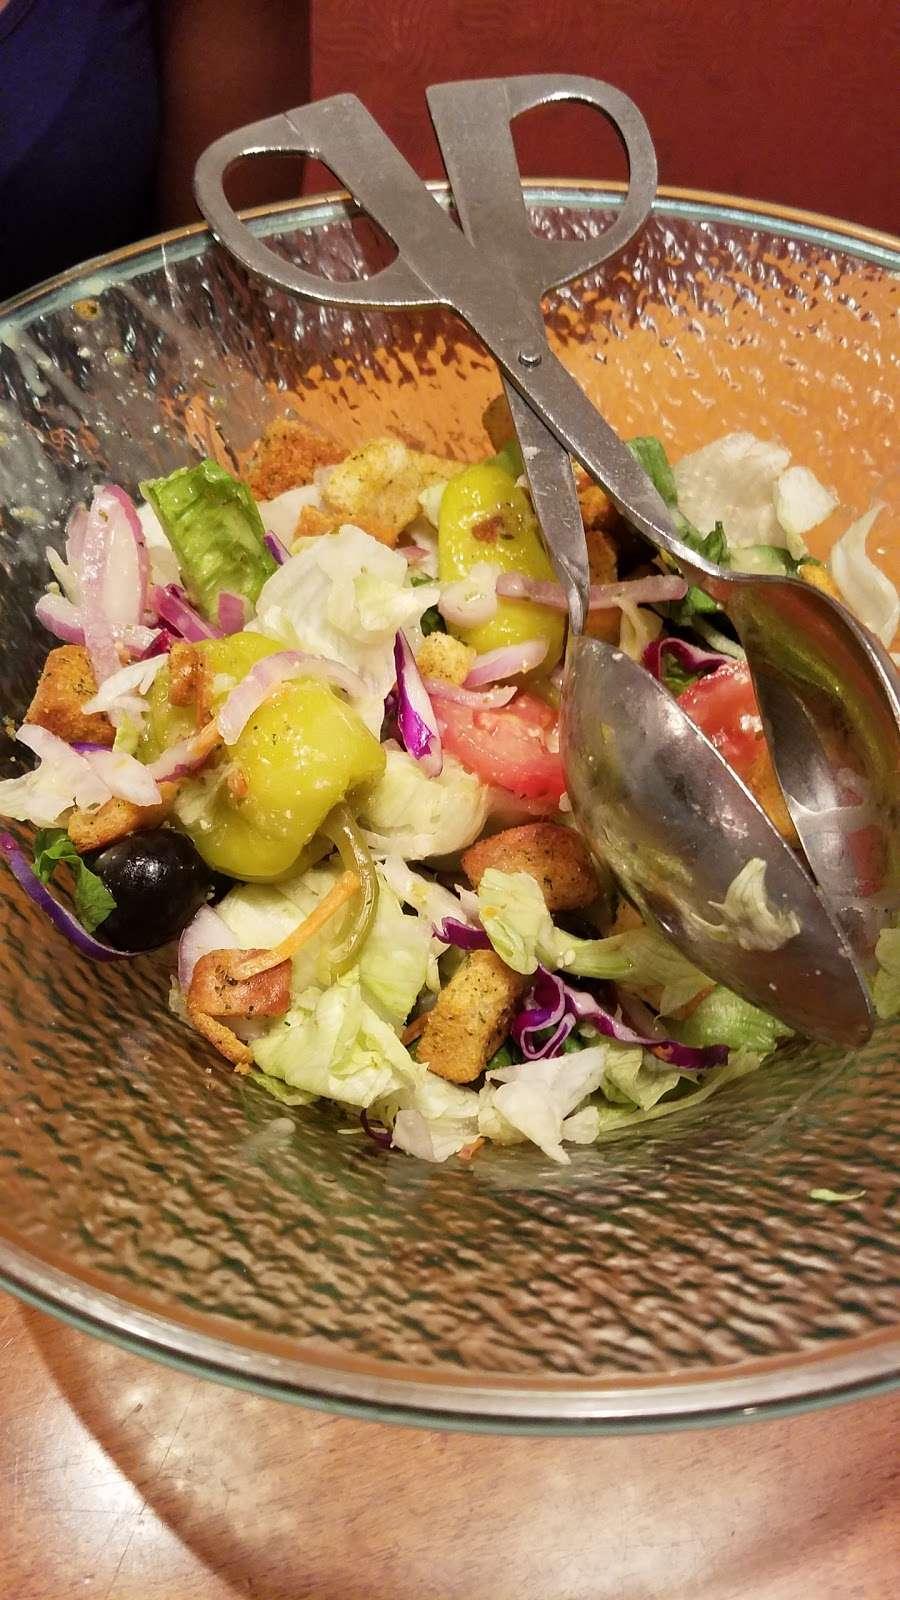 Olive Garden Italian Restaurant - meal takeaway  | Photo 10 of 10 | Address: 505 Gateway Dr, Brooklyn, NY 11239, USA | Phone: (718) 348-1071